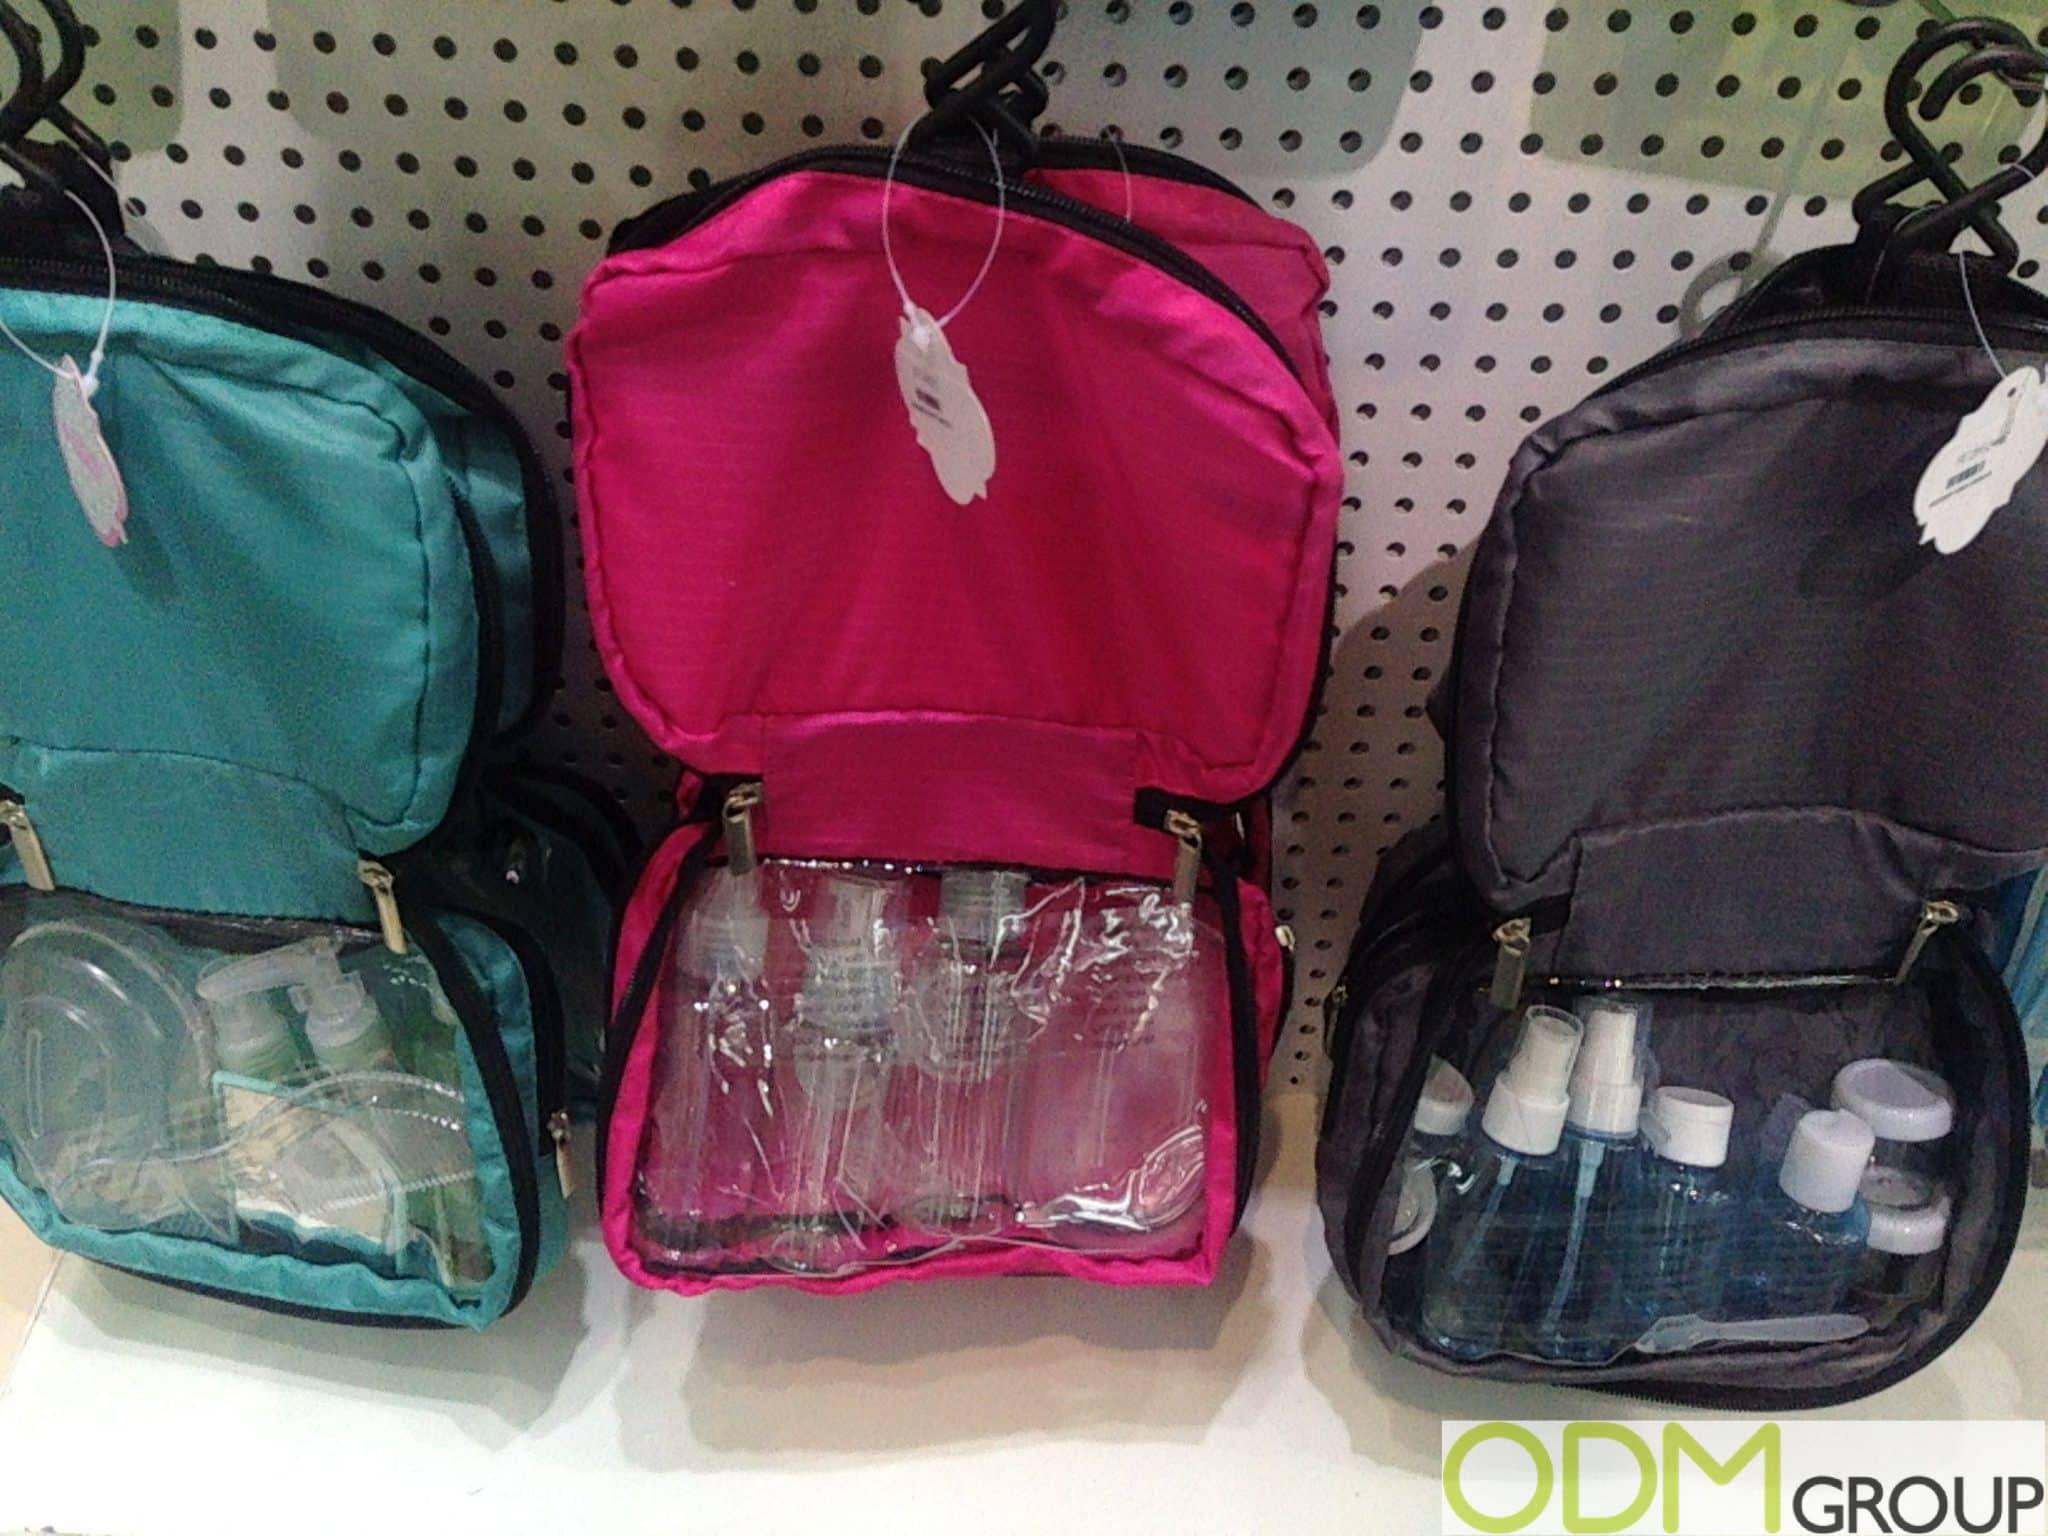 Handy Travel Accessories - Custom Toiletry Bags